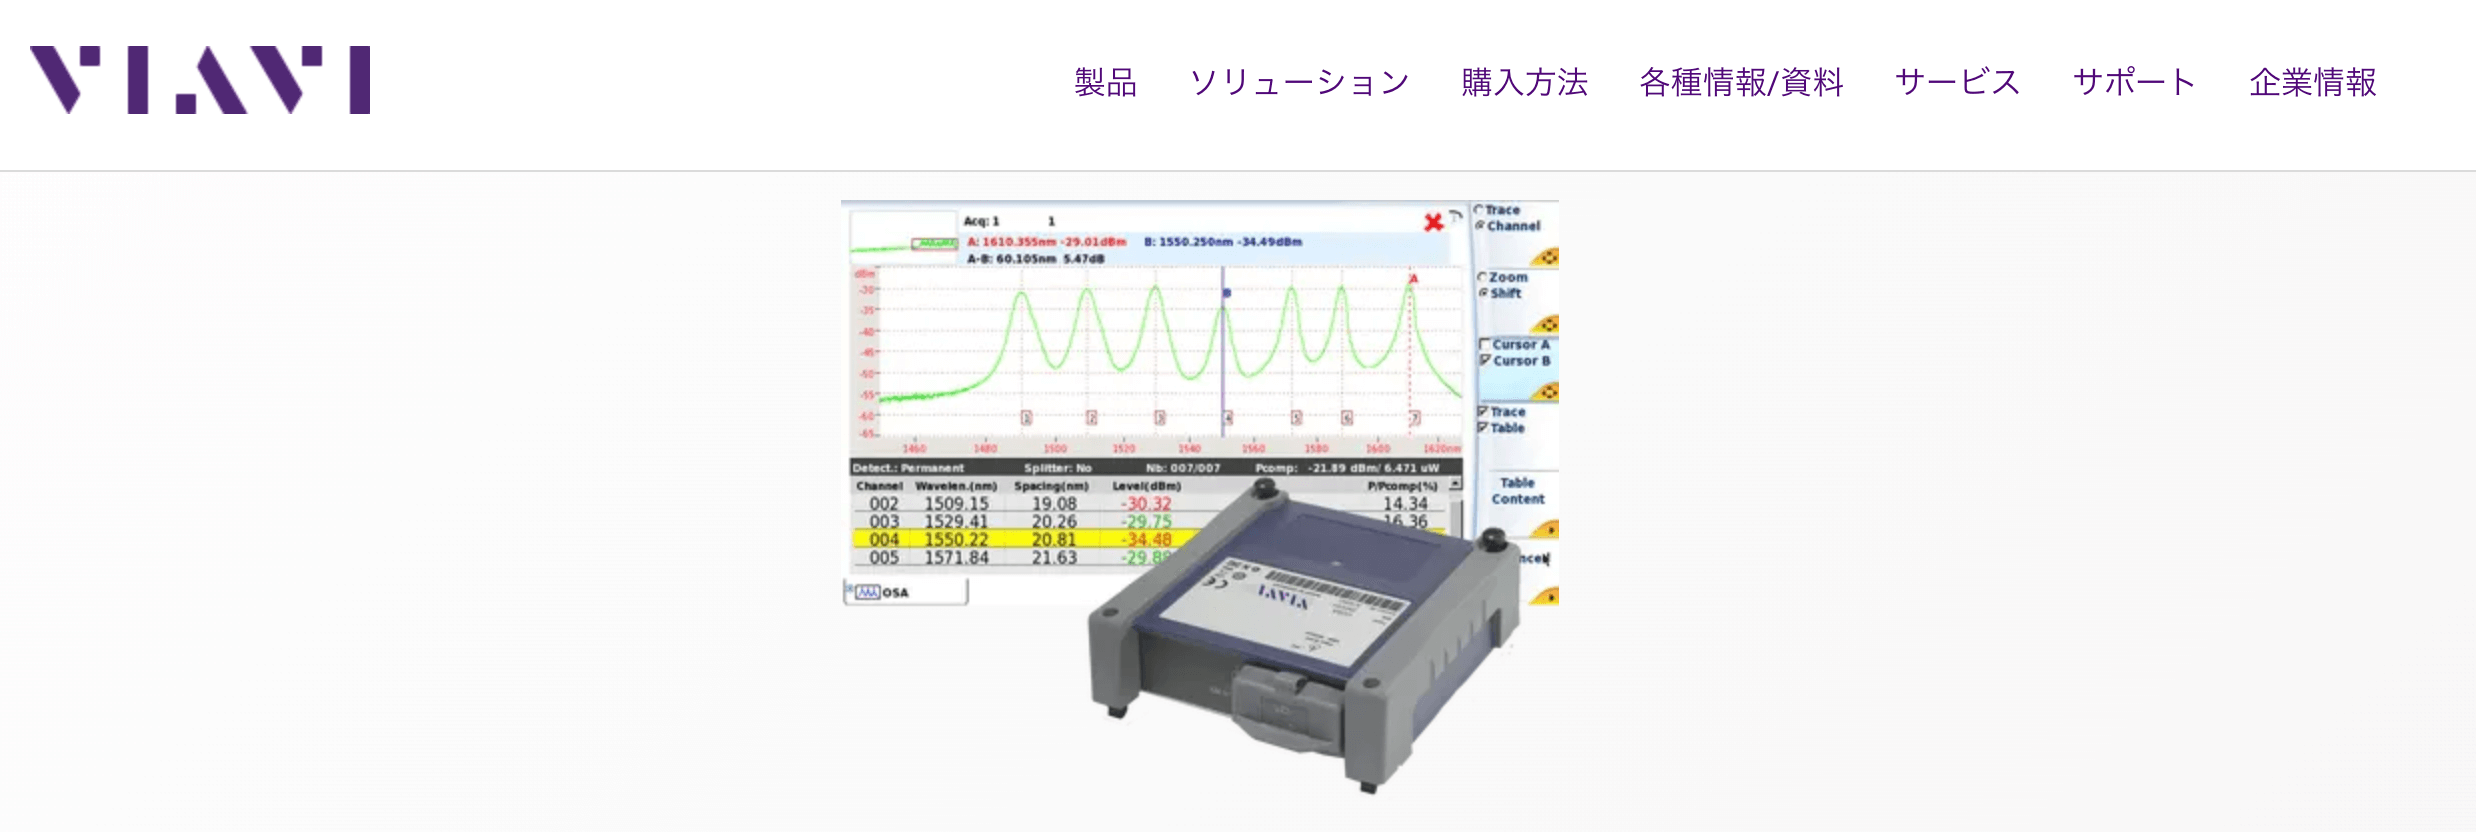 COSA-4055 CWDM OSA: MTS-5800, -4000 V2,-2000マルチ・サービス・プラットフォーム用COSA-4055 CWDM光スペクトラム・アナライザ・モジュール